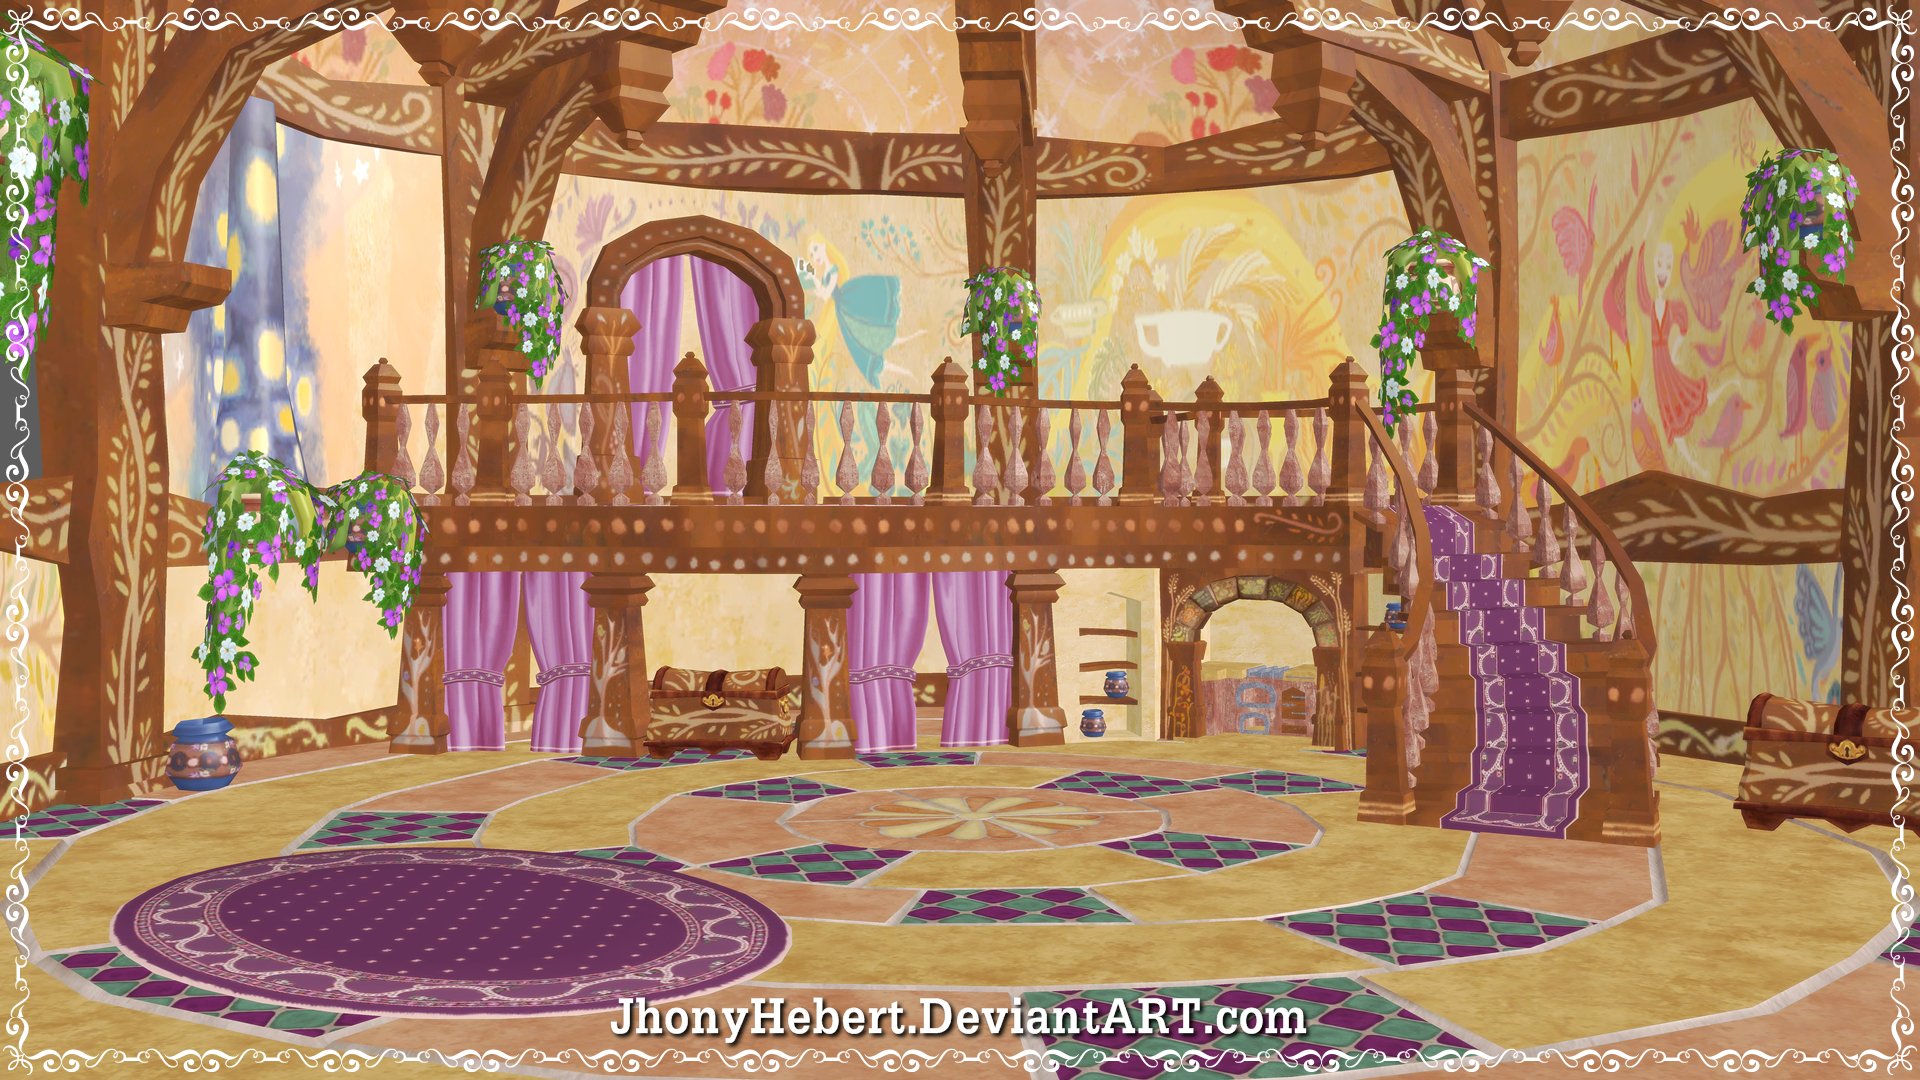 Rooms: Room Rapunzel's By JhonyHebert.deviantart.com On